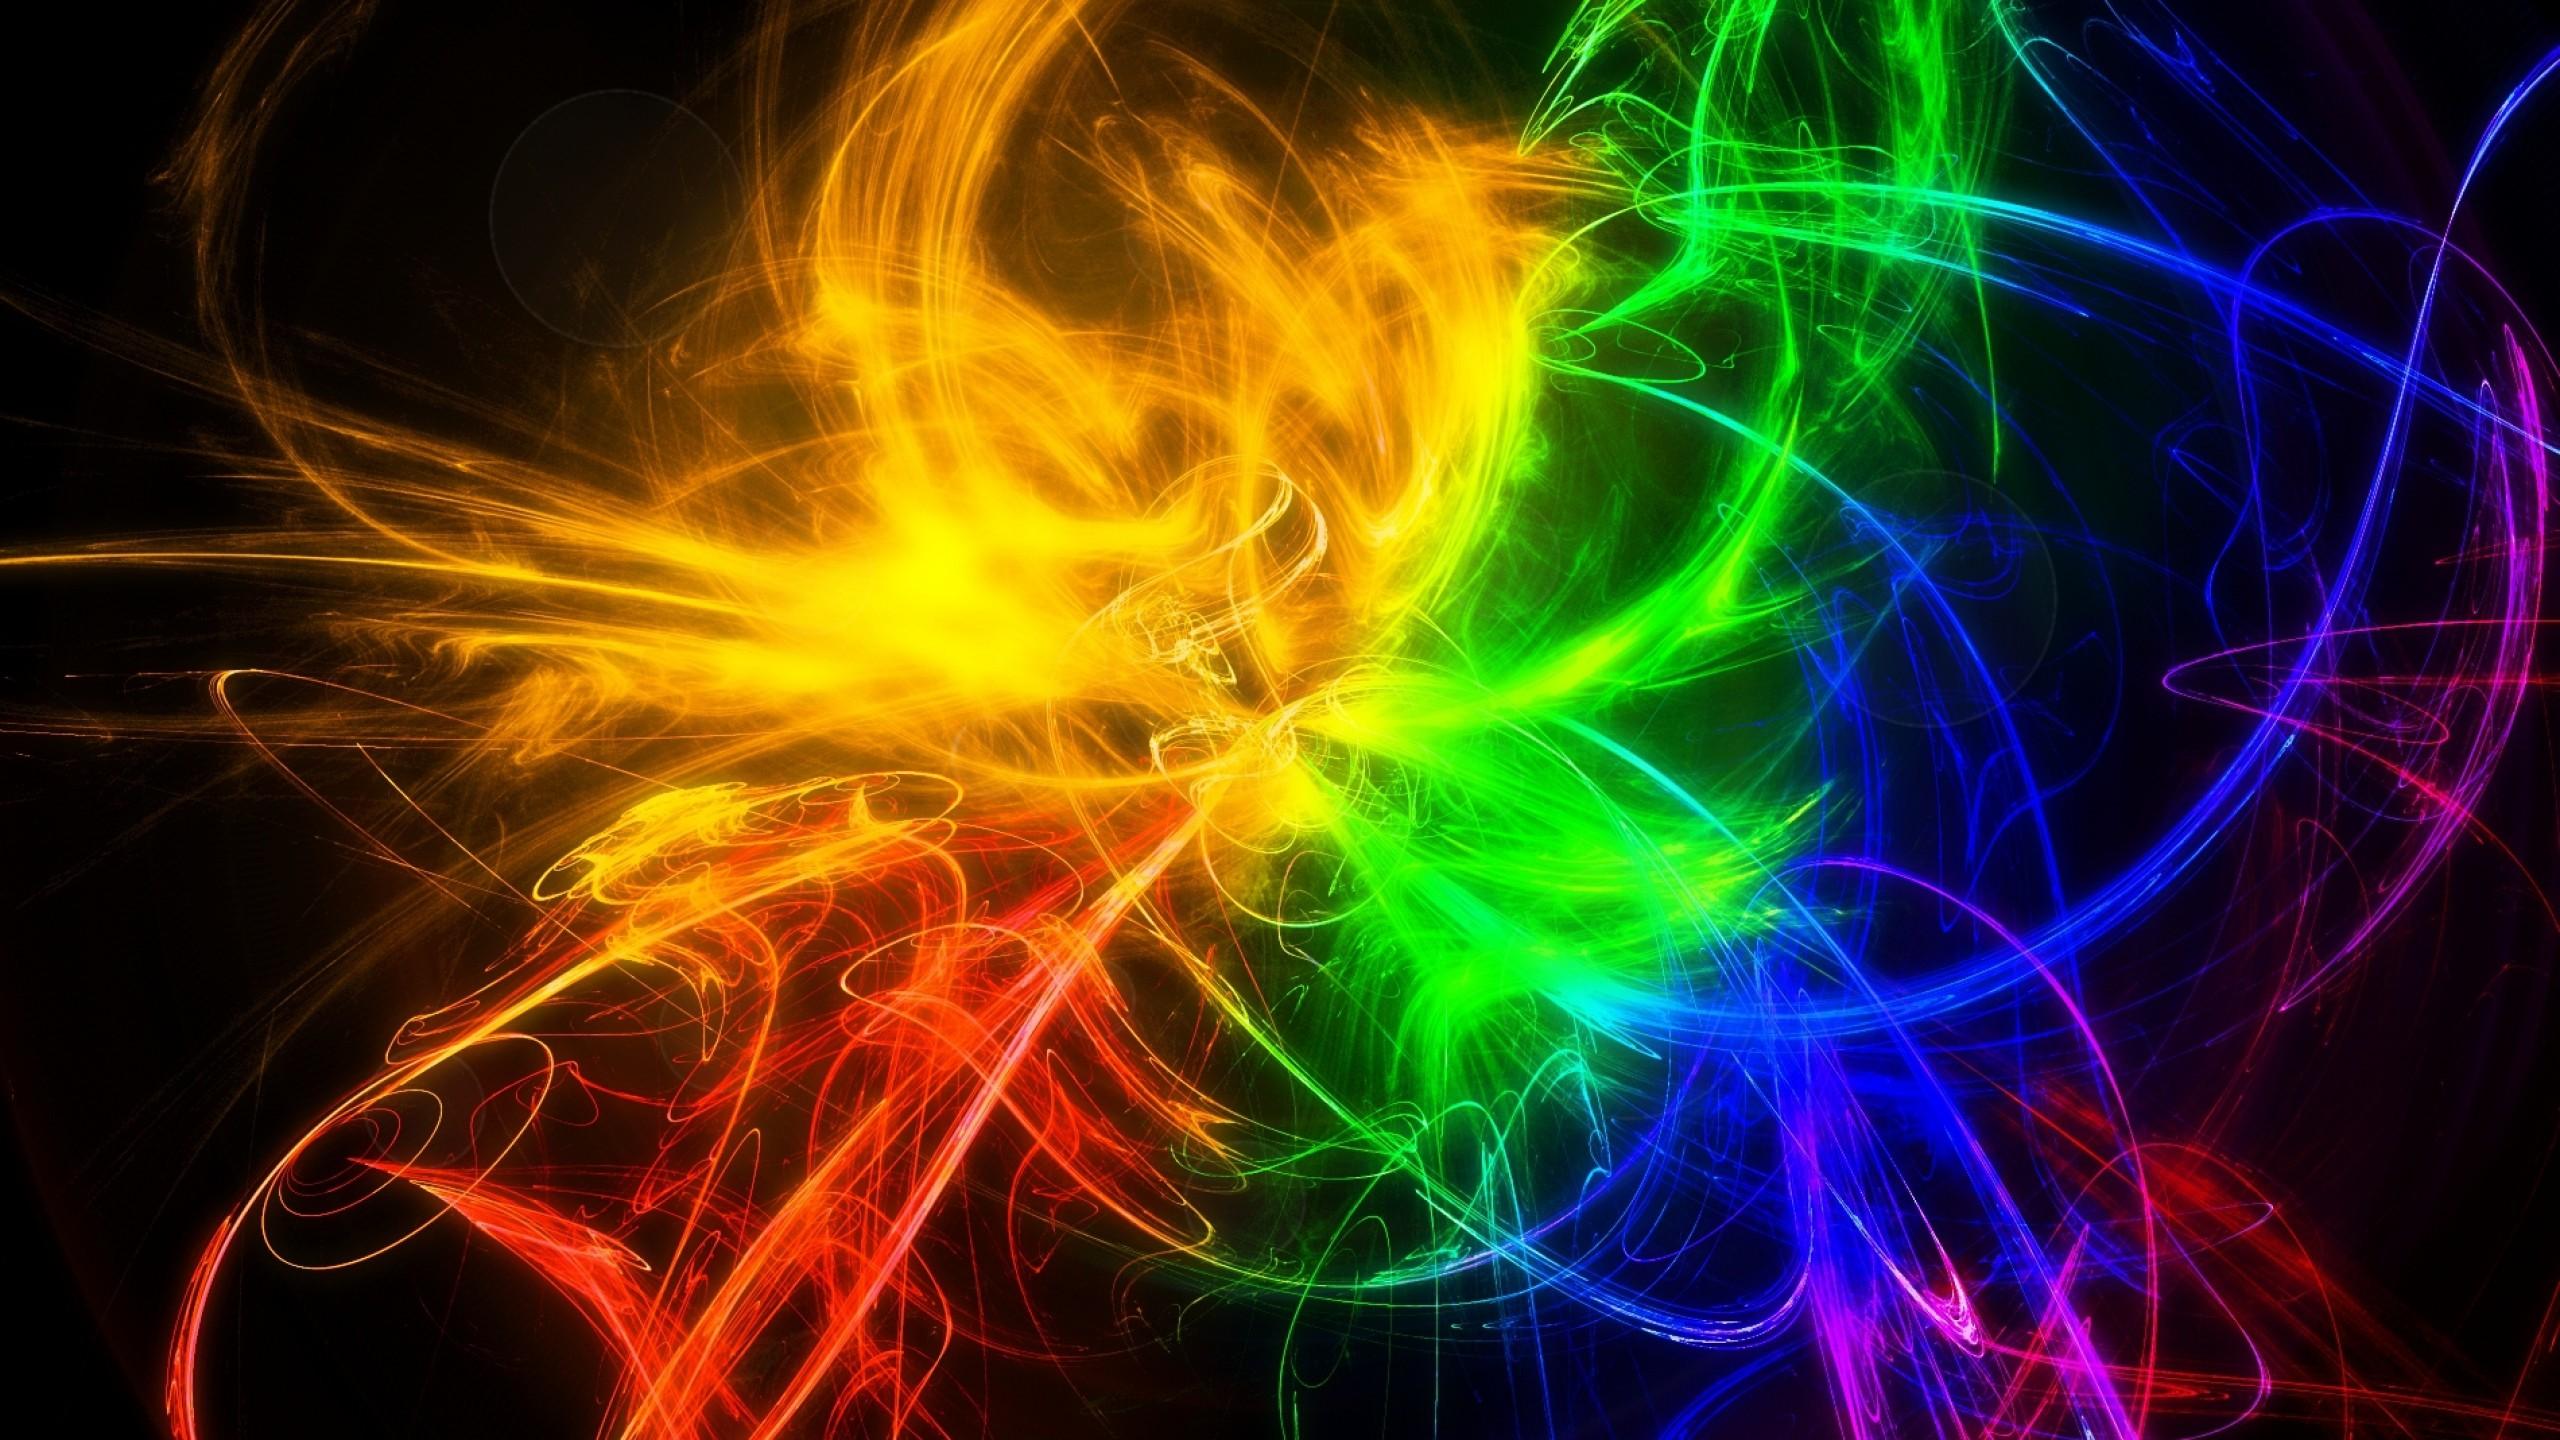 Wallpaper smoke, multi-colored, lines, patterns, bright